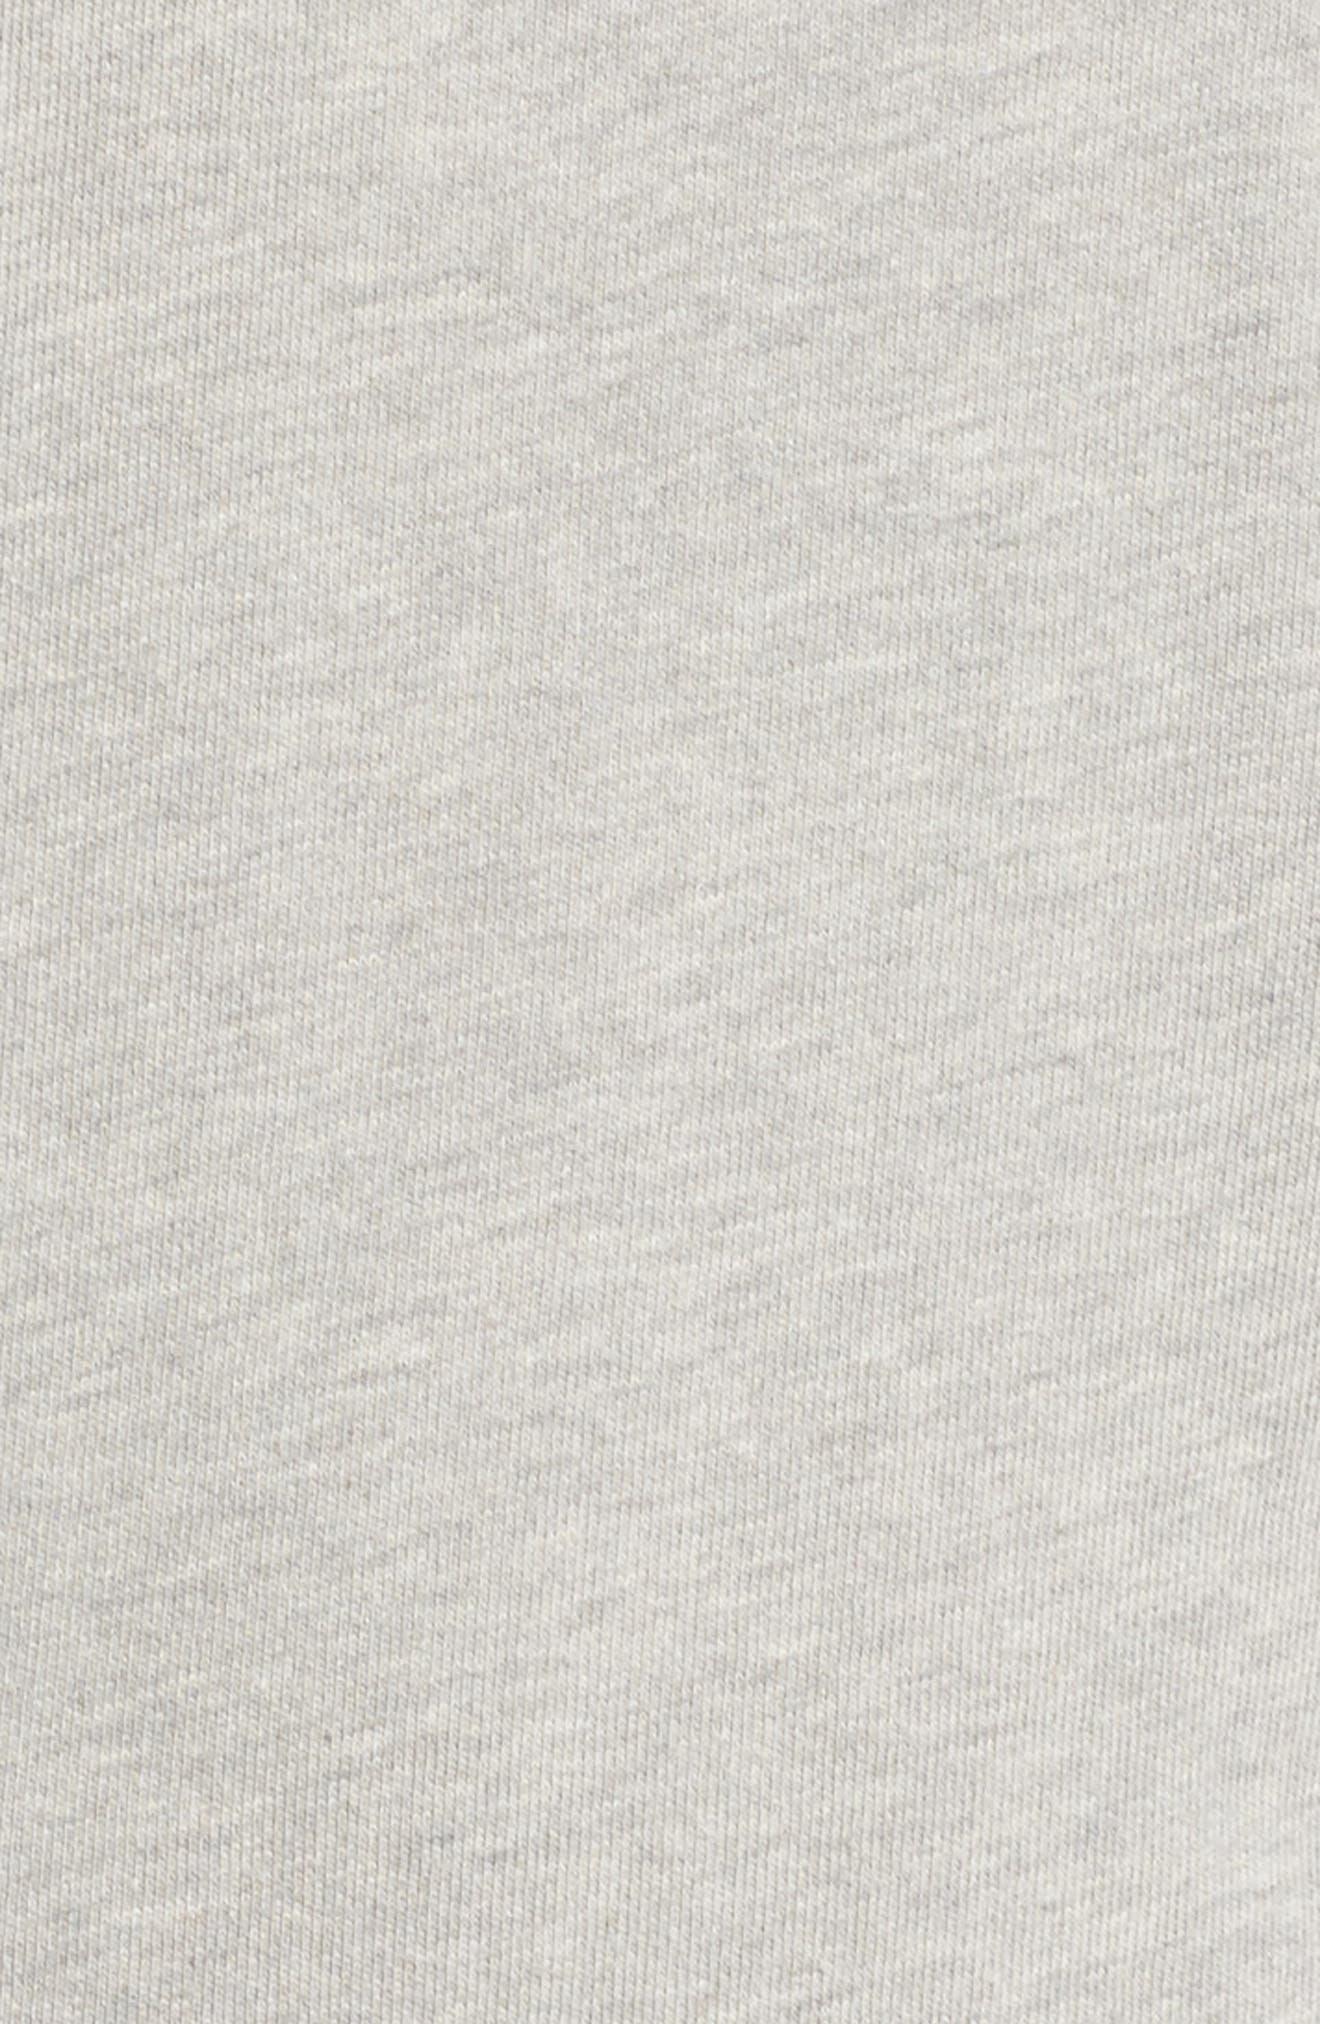 NFL Seattle Seahawks Hacci Sweatshirt,                             Alternate thumbnail 5, color,                             Dove Heather Grey